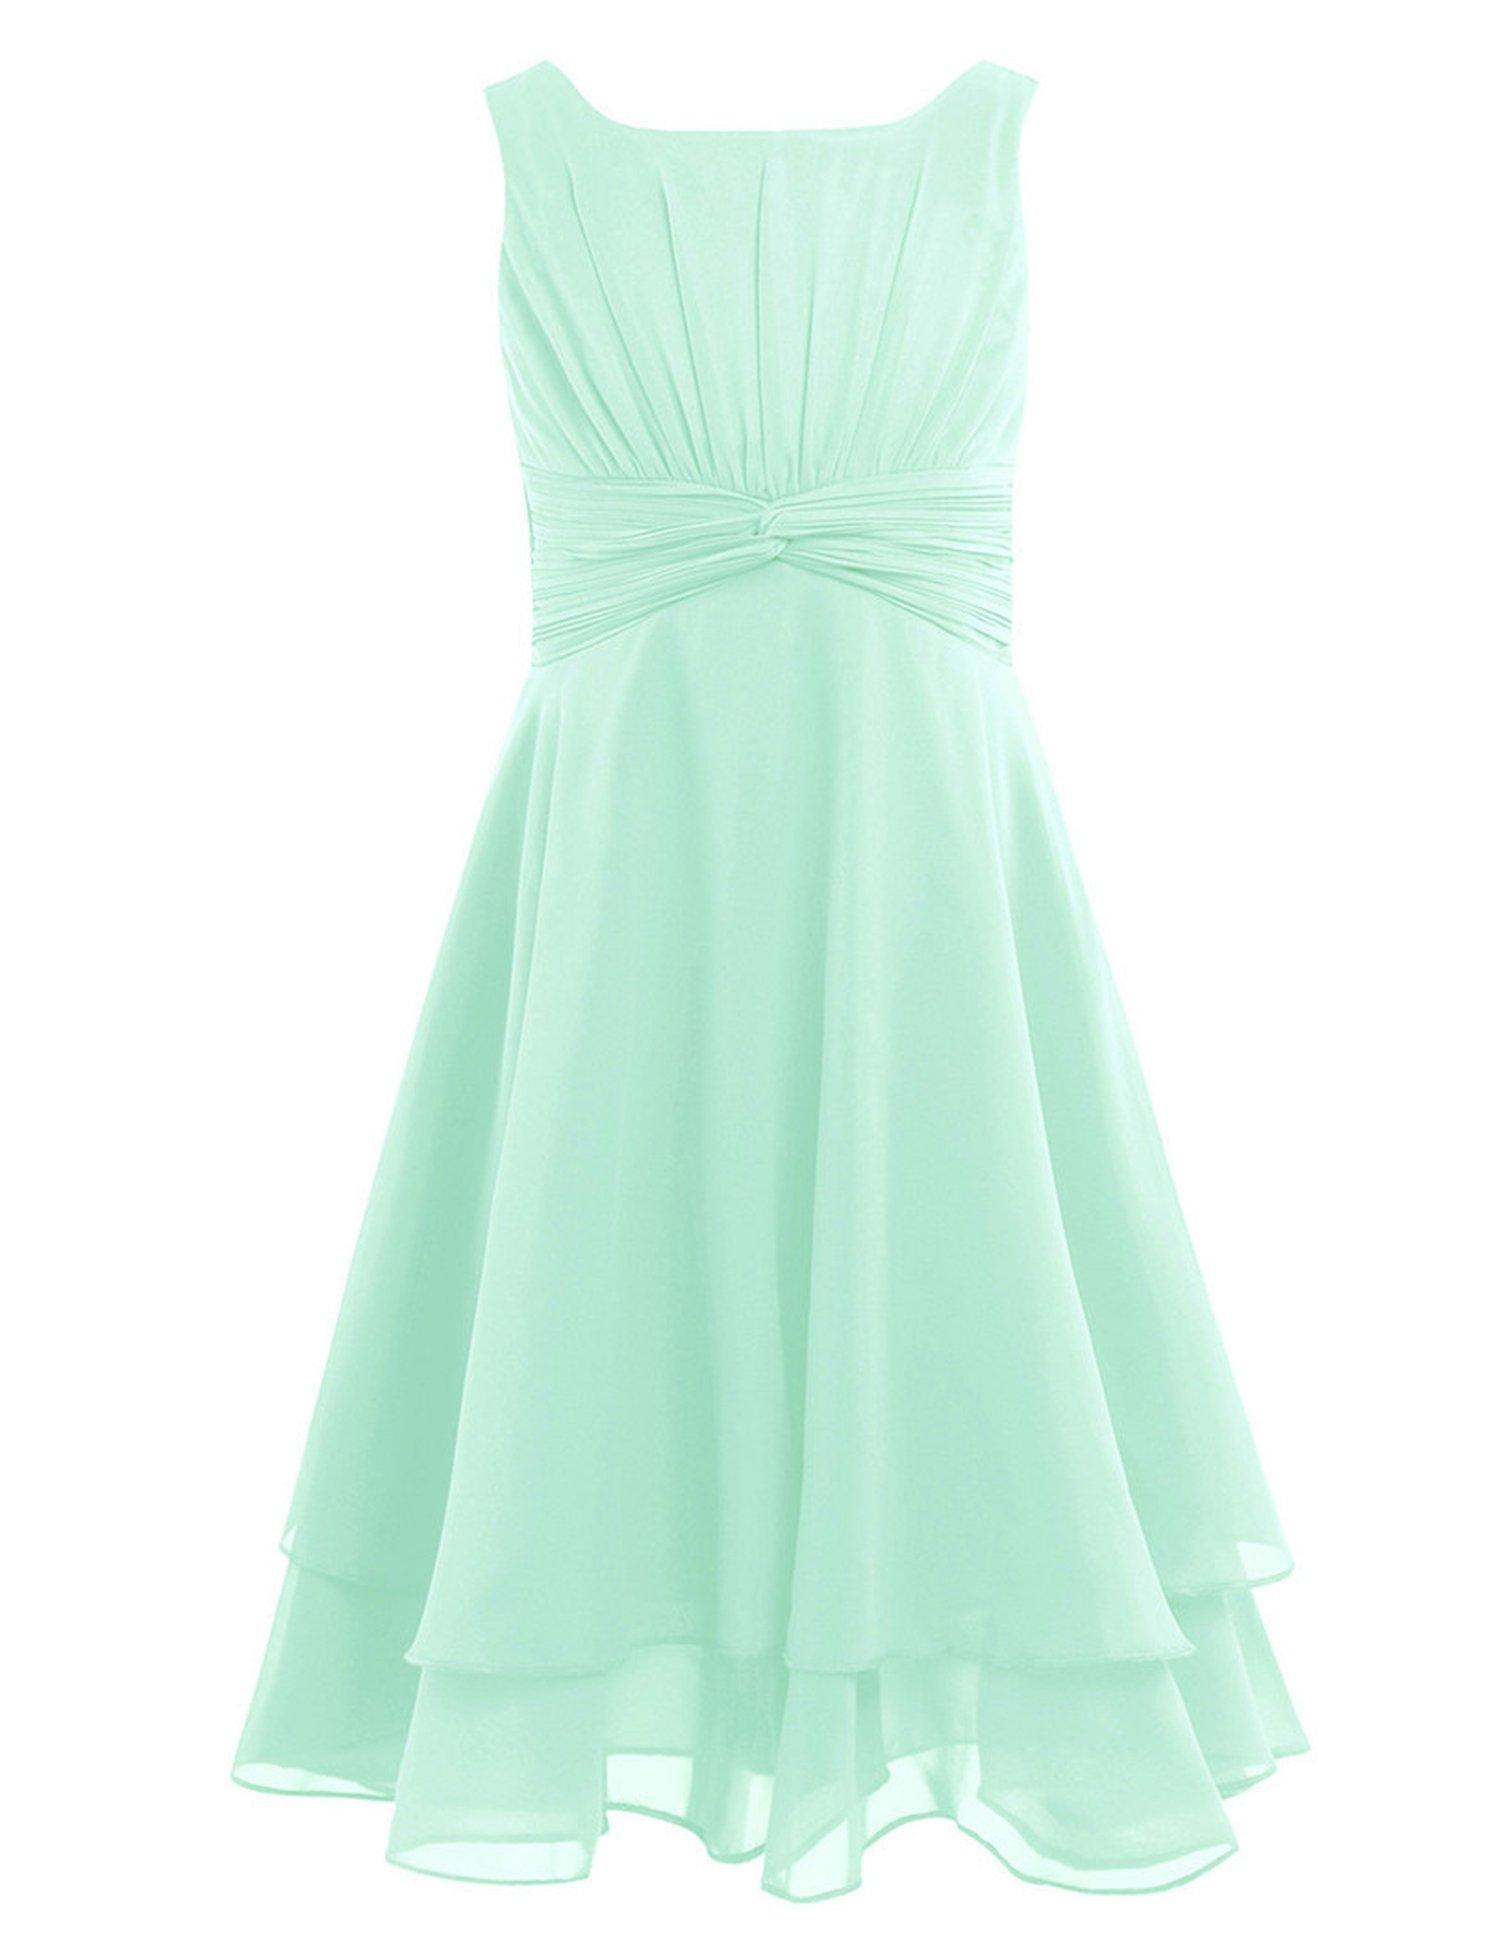 4-14Y Little Girls Ball Gown Flower Girls Dresses First Communion Dress Vestidos Pageant Dresses,Mint Green,Child-4